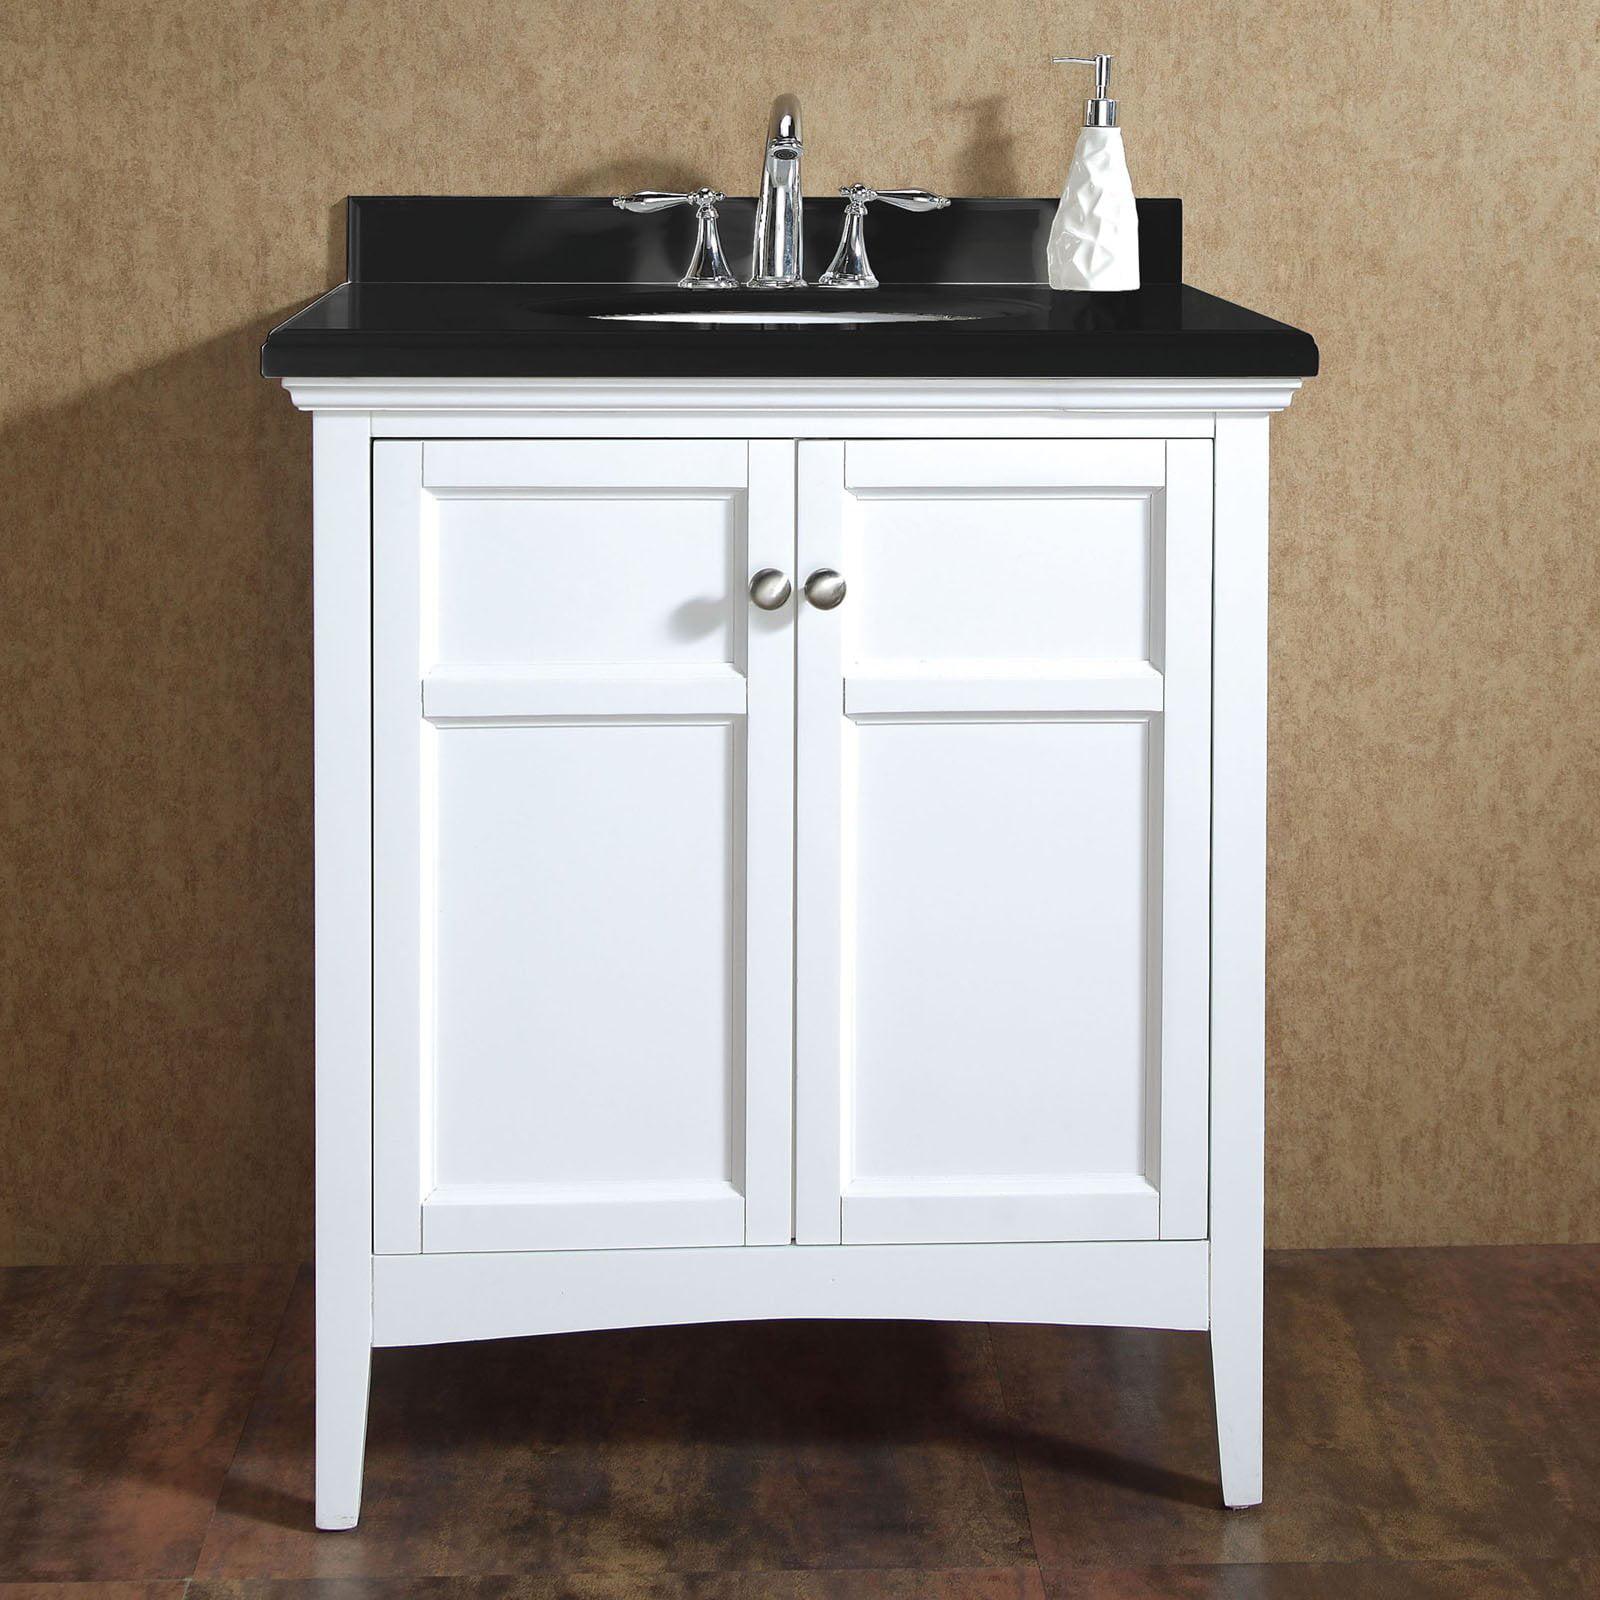 Ove Decors Campo 30-in. Single Bathroom Vanity - Walmart.com